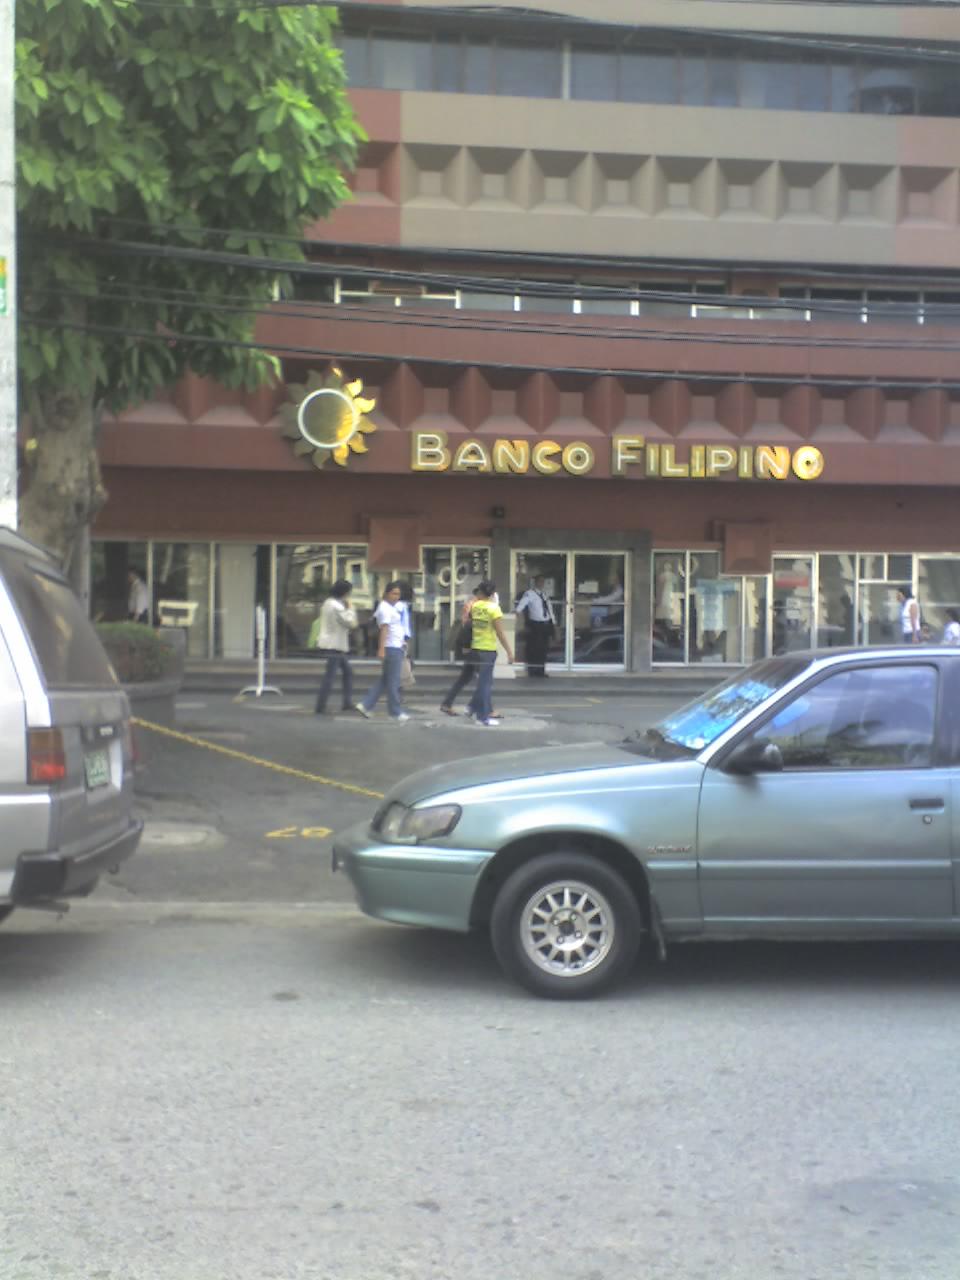 BANCO FILIPINO